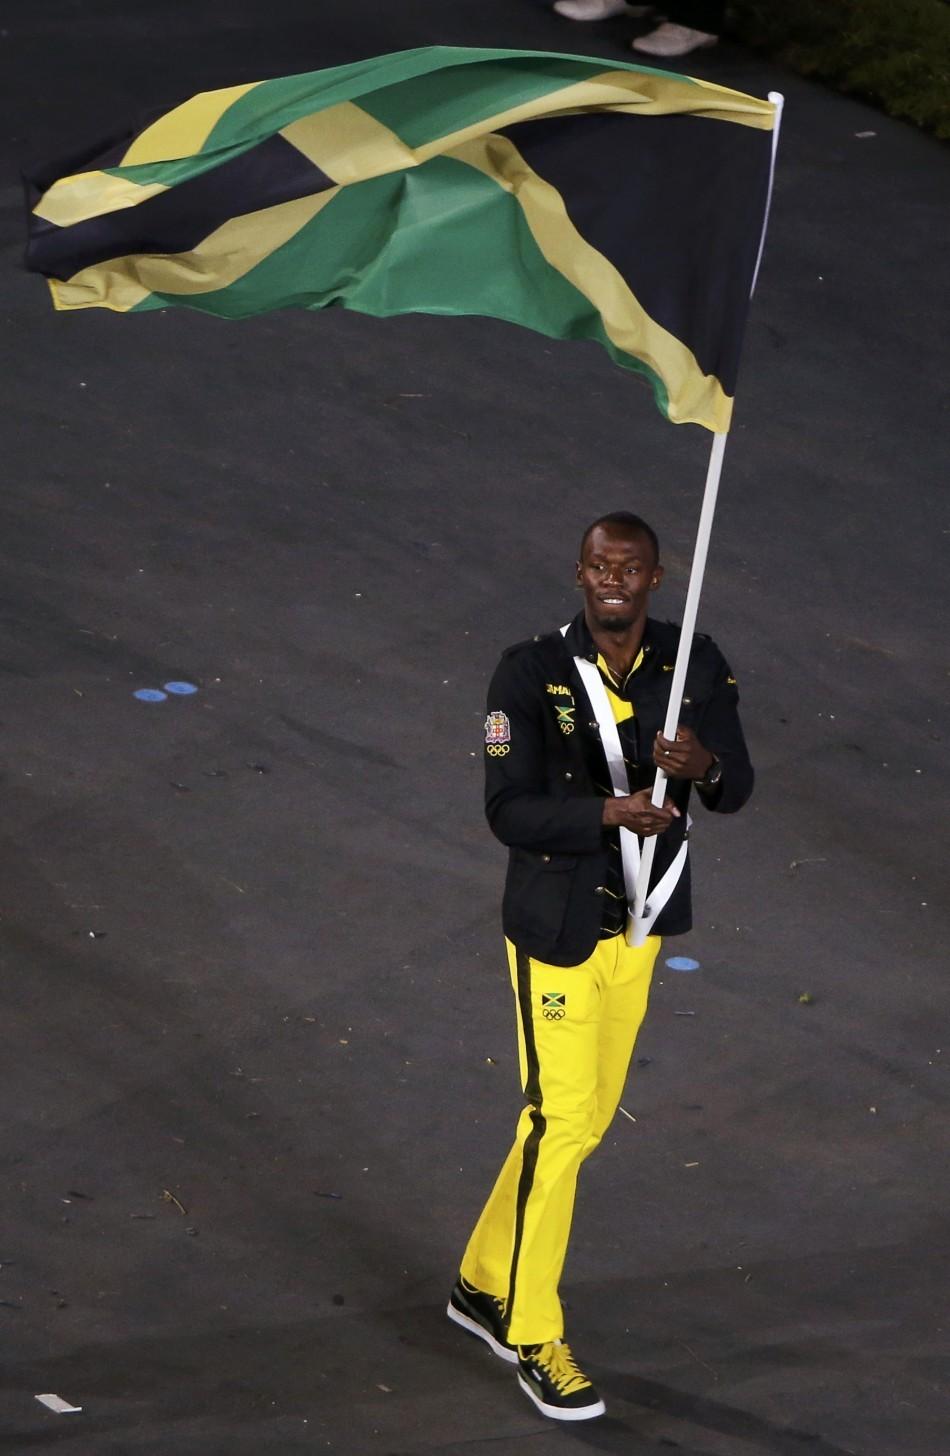 Usain Bolt, London 2012 Olympic